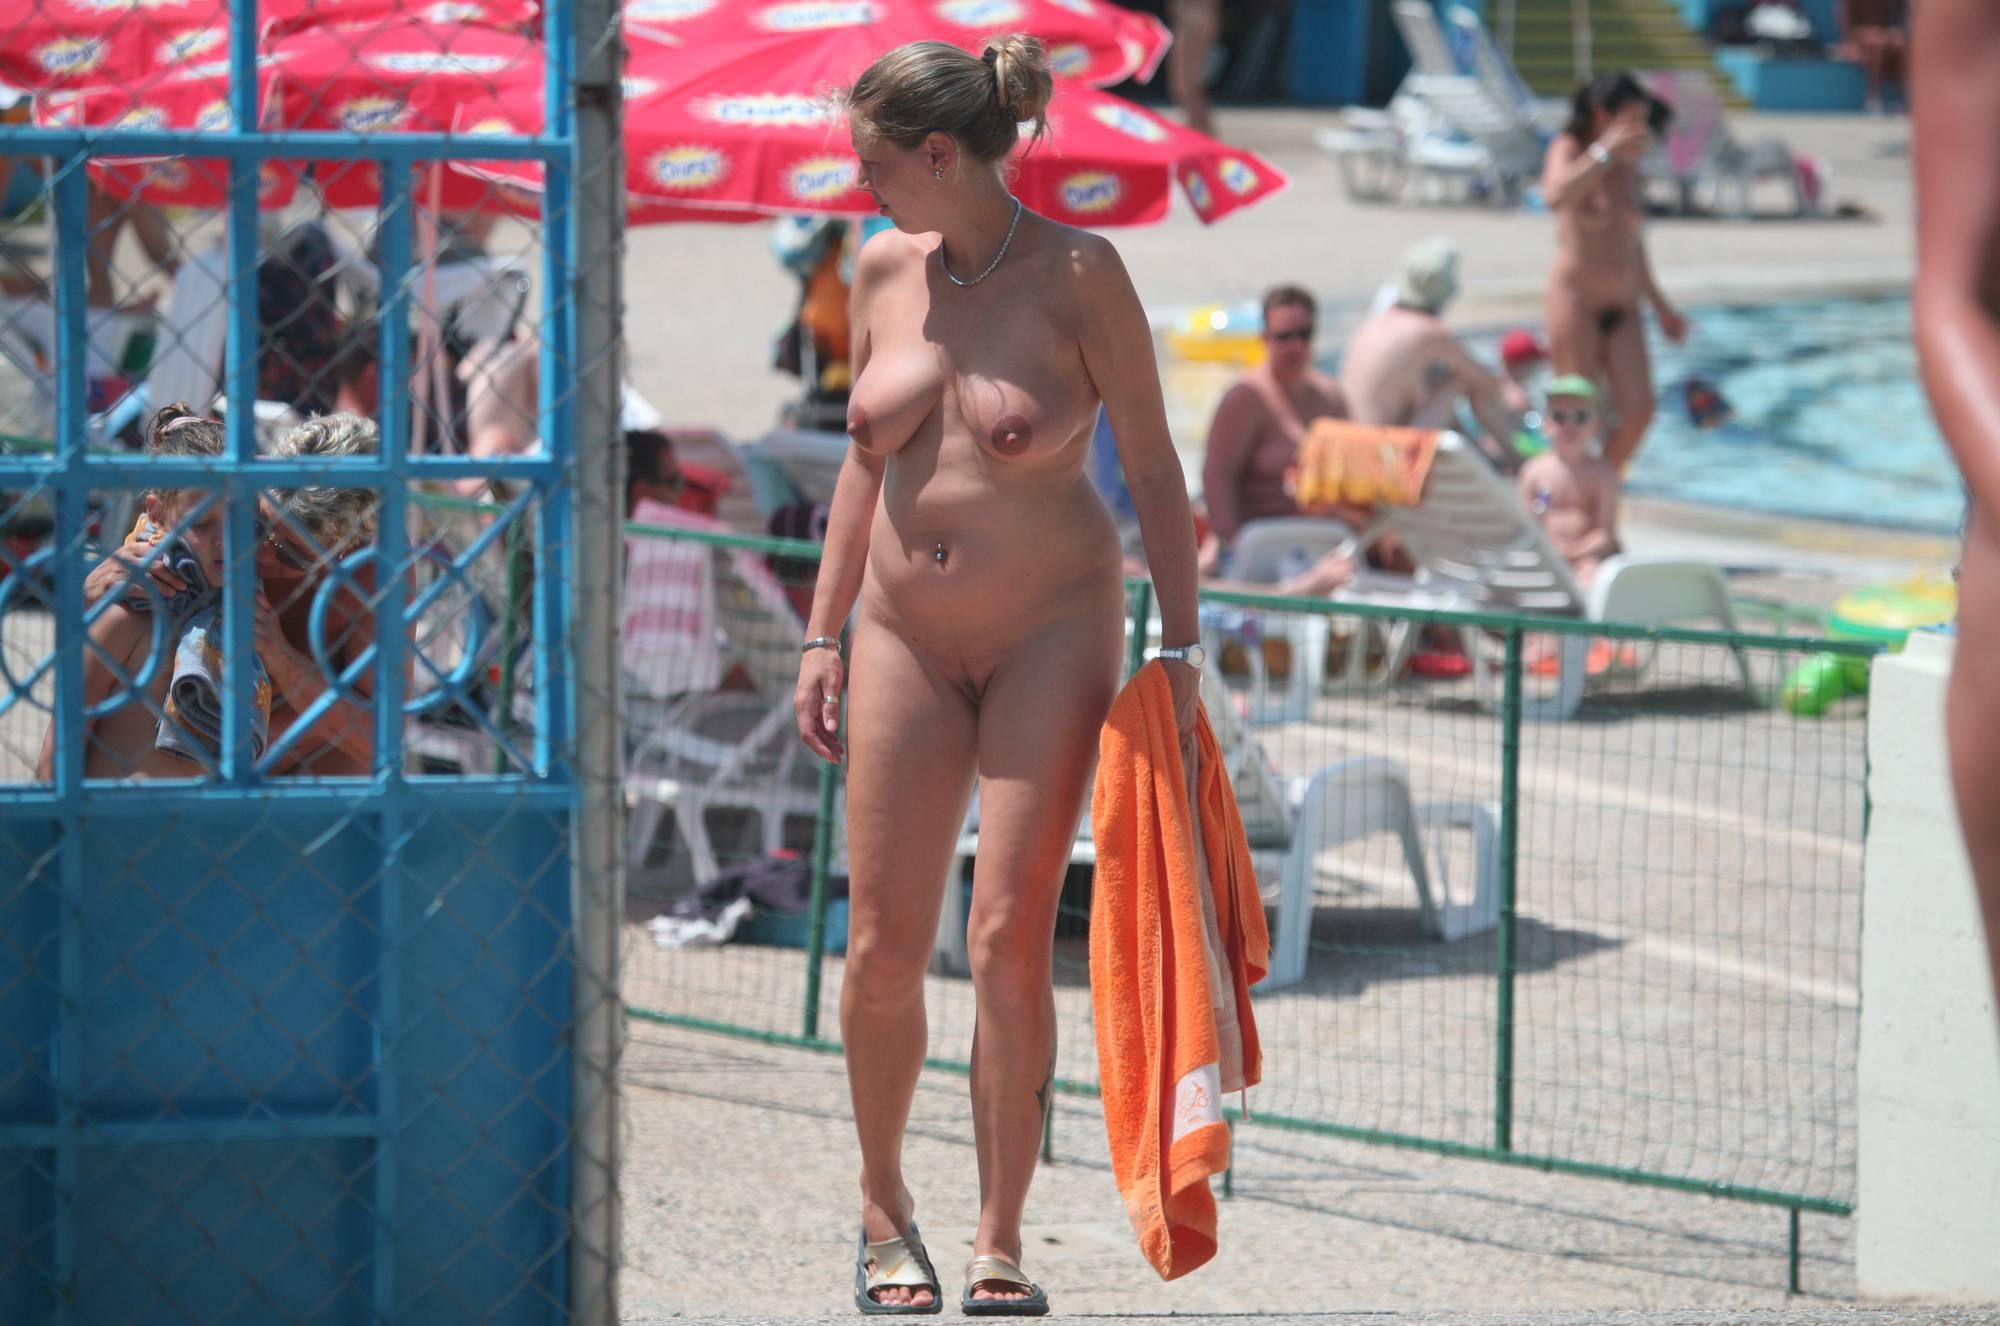 Pure Nudism Photos-Nudist Pool Guests Enter - 4